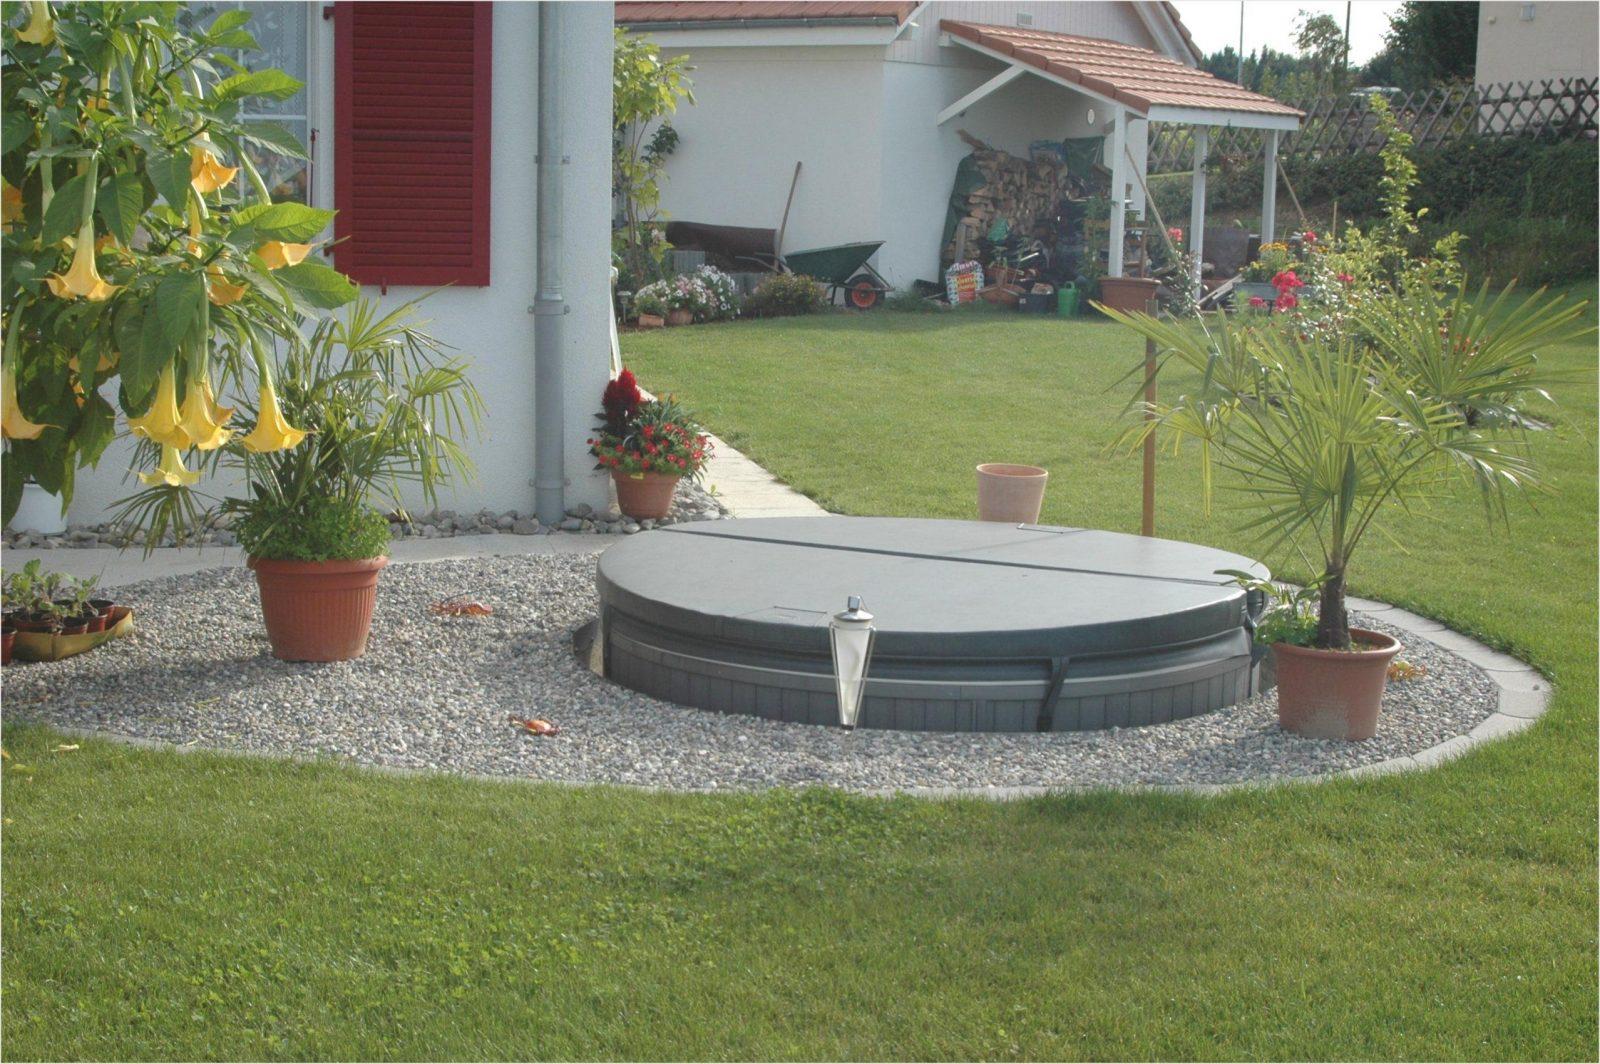 Spannende Badebottich Selber Bauen Beautiful Hot Tub Selber Bauen von Hot Tube Selber Bauen Bild